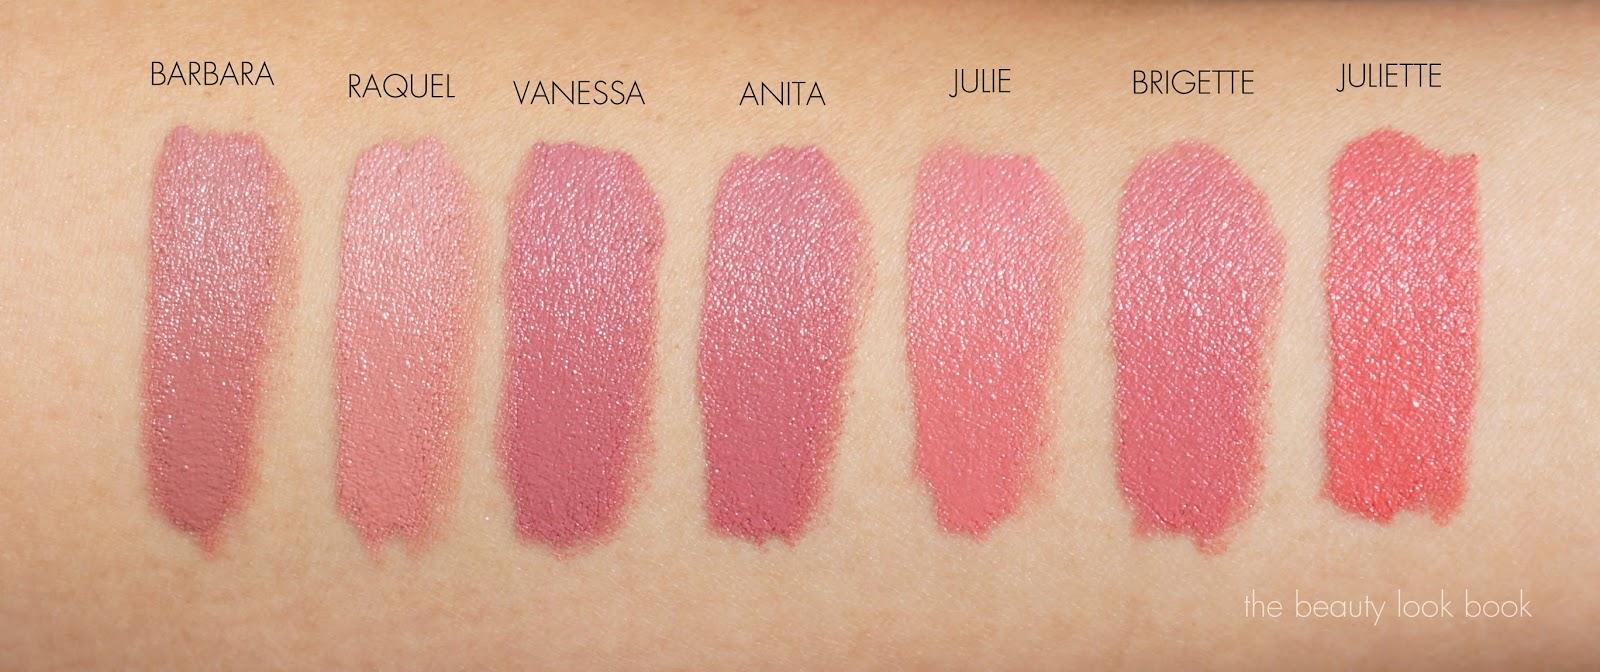 Audacious Lipstick by NARS #10